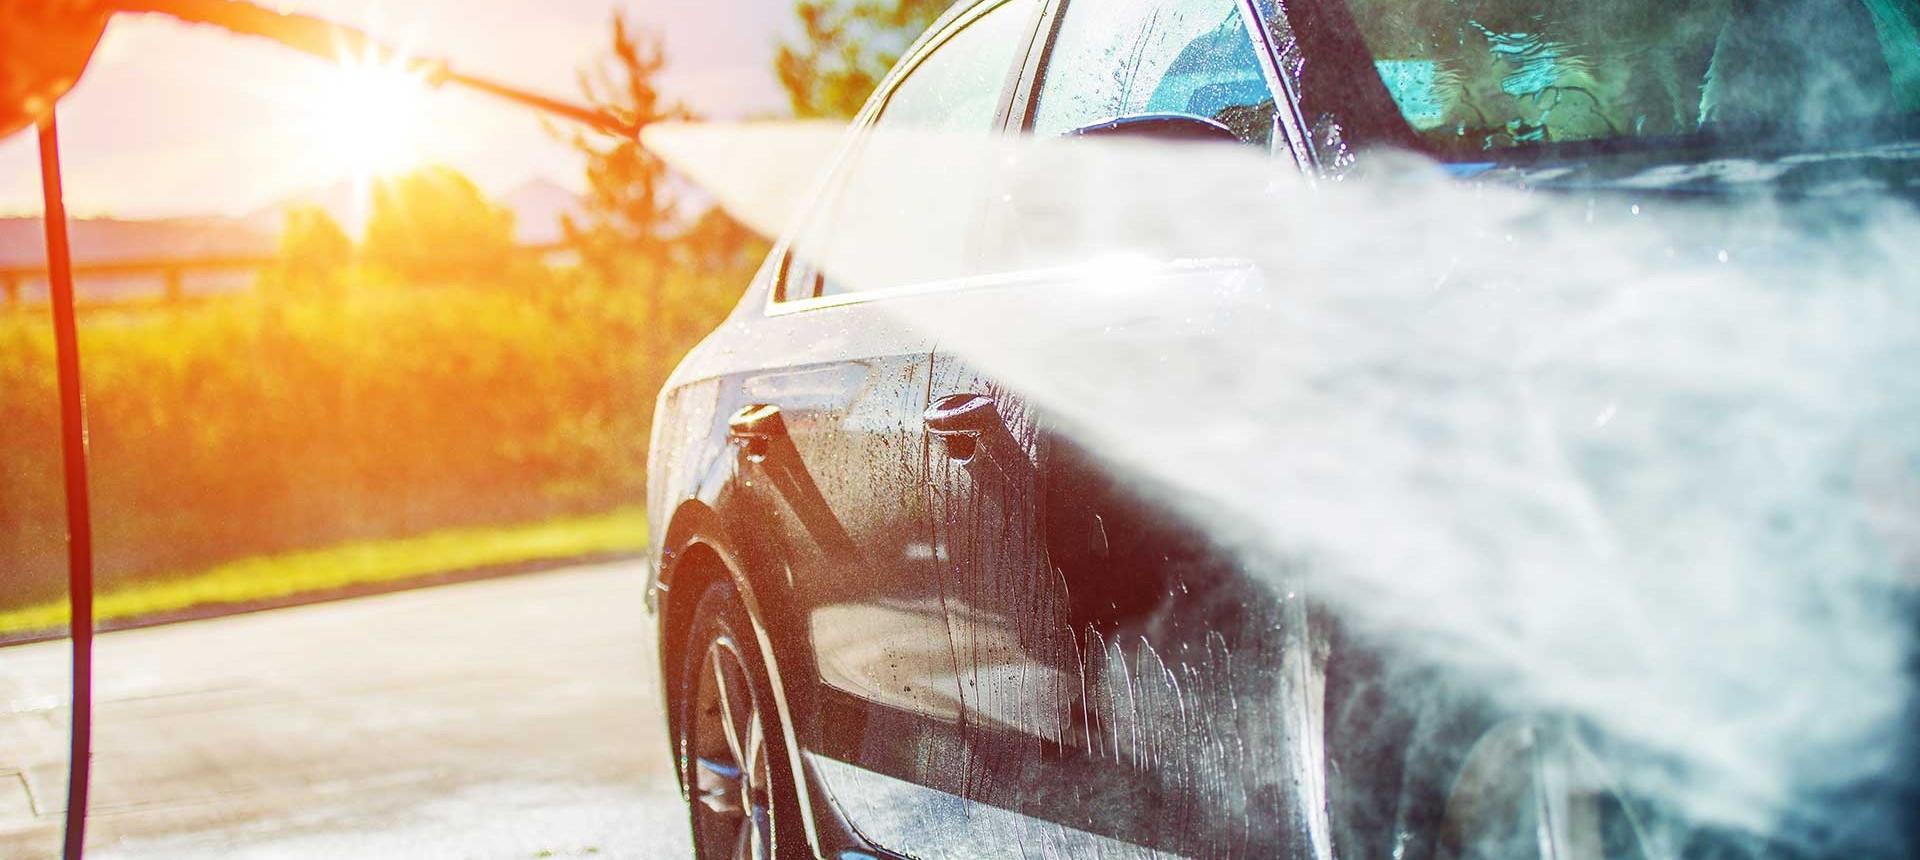 Car Zone Autókozmetika